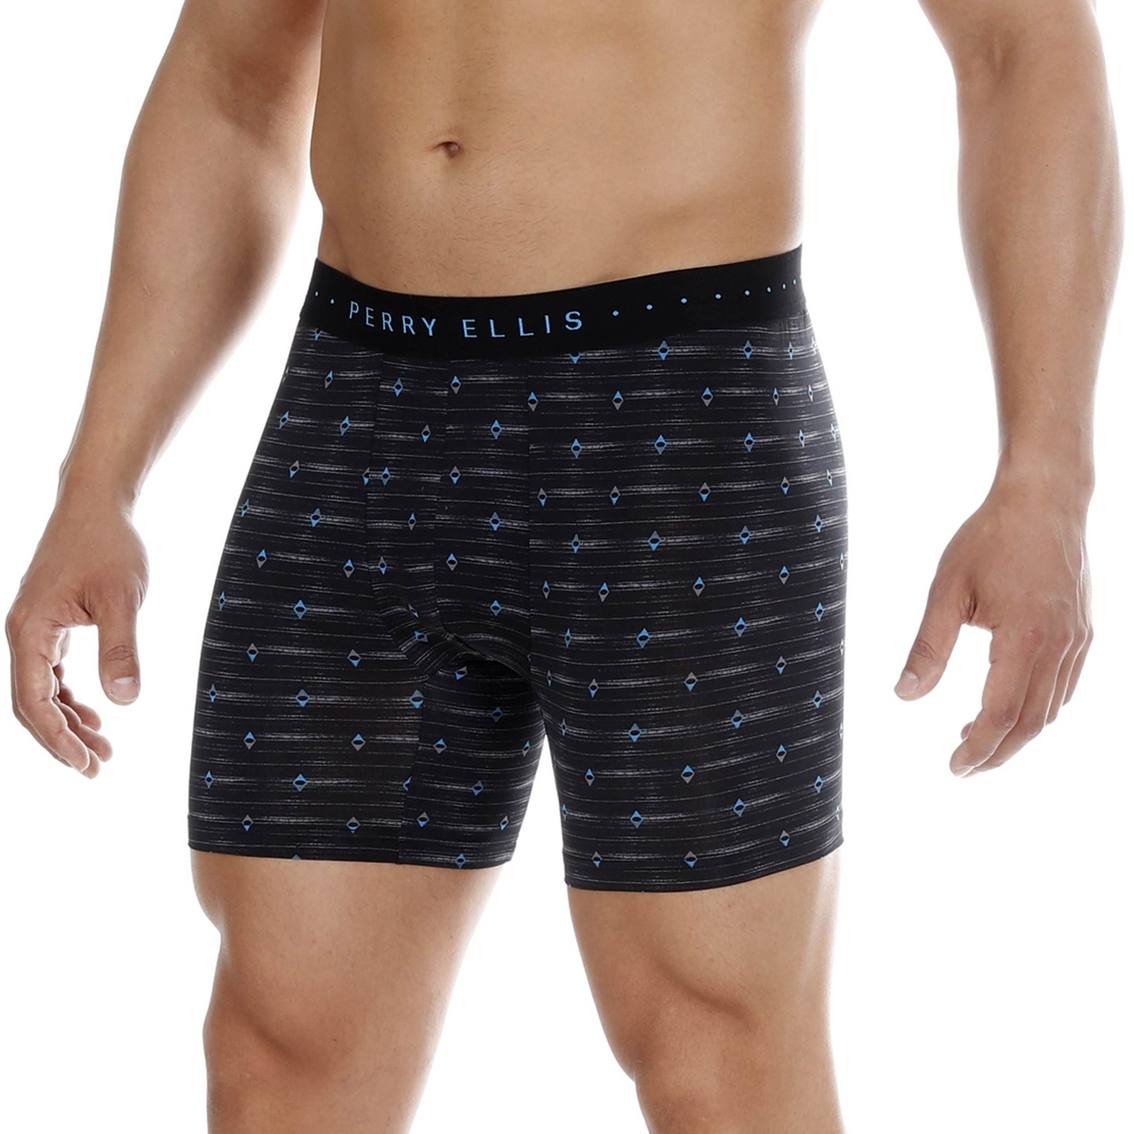 Perry Ellis Print Boxer Briefs Underwear Apparel Shop The Exchange